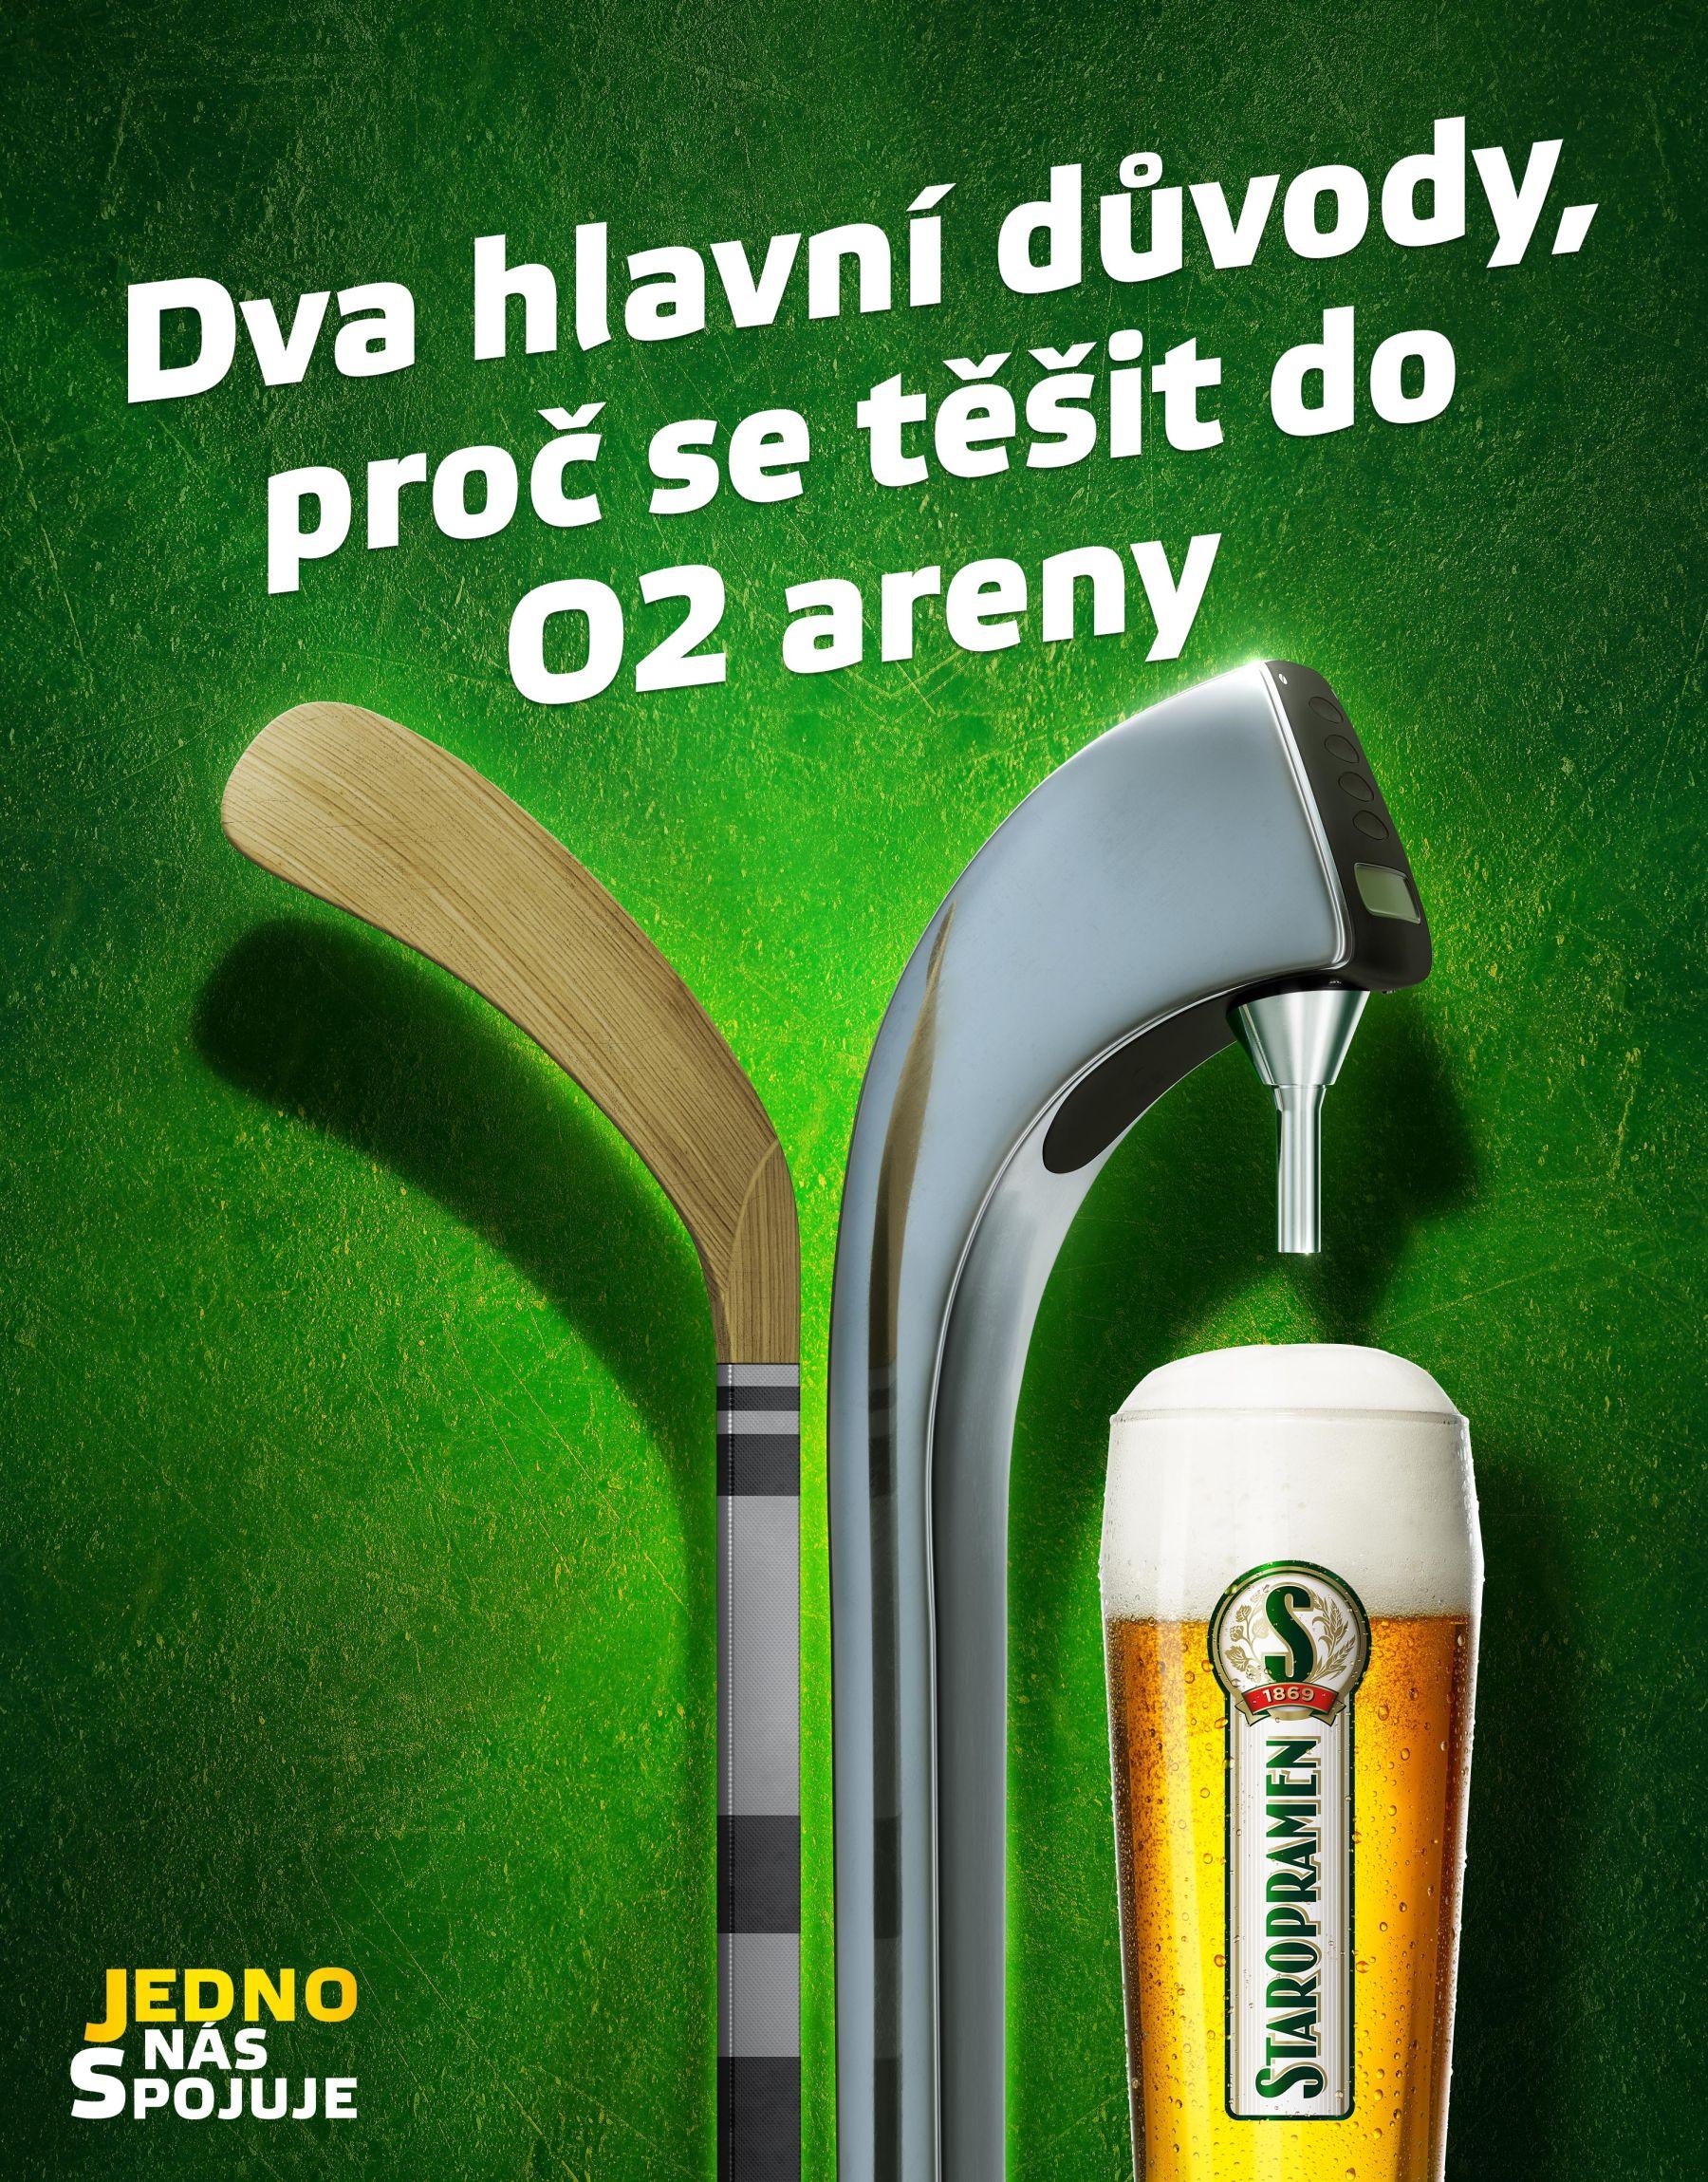 Staropramen zdůrazňuje v kampani partnerství s O2 Arénou